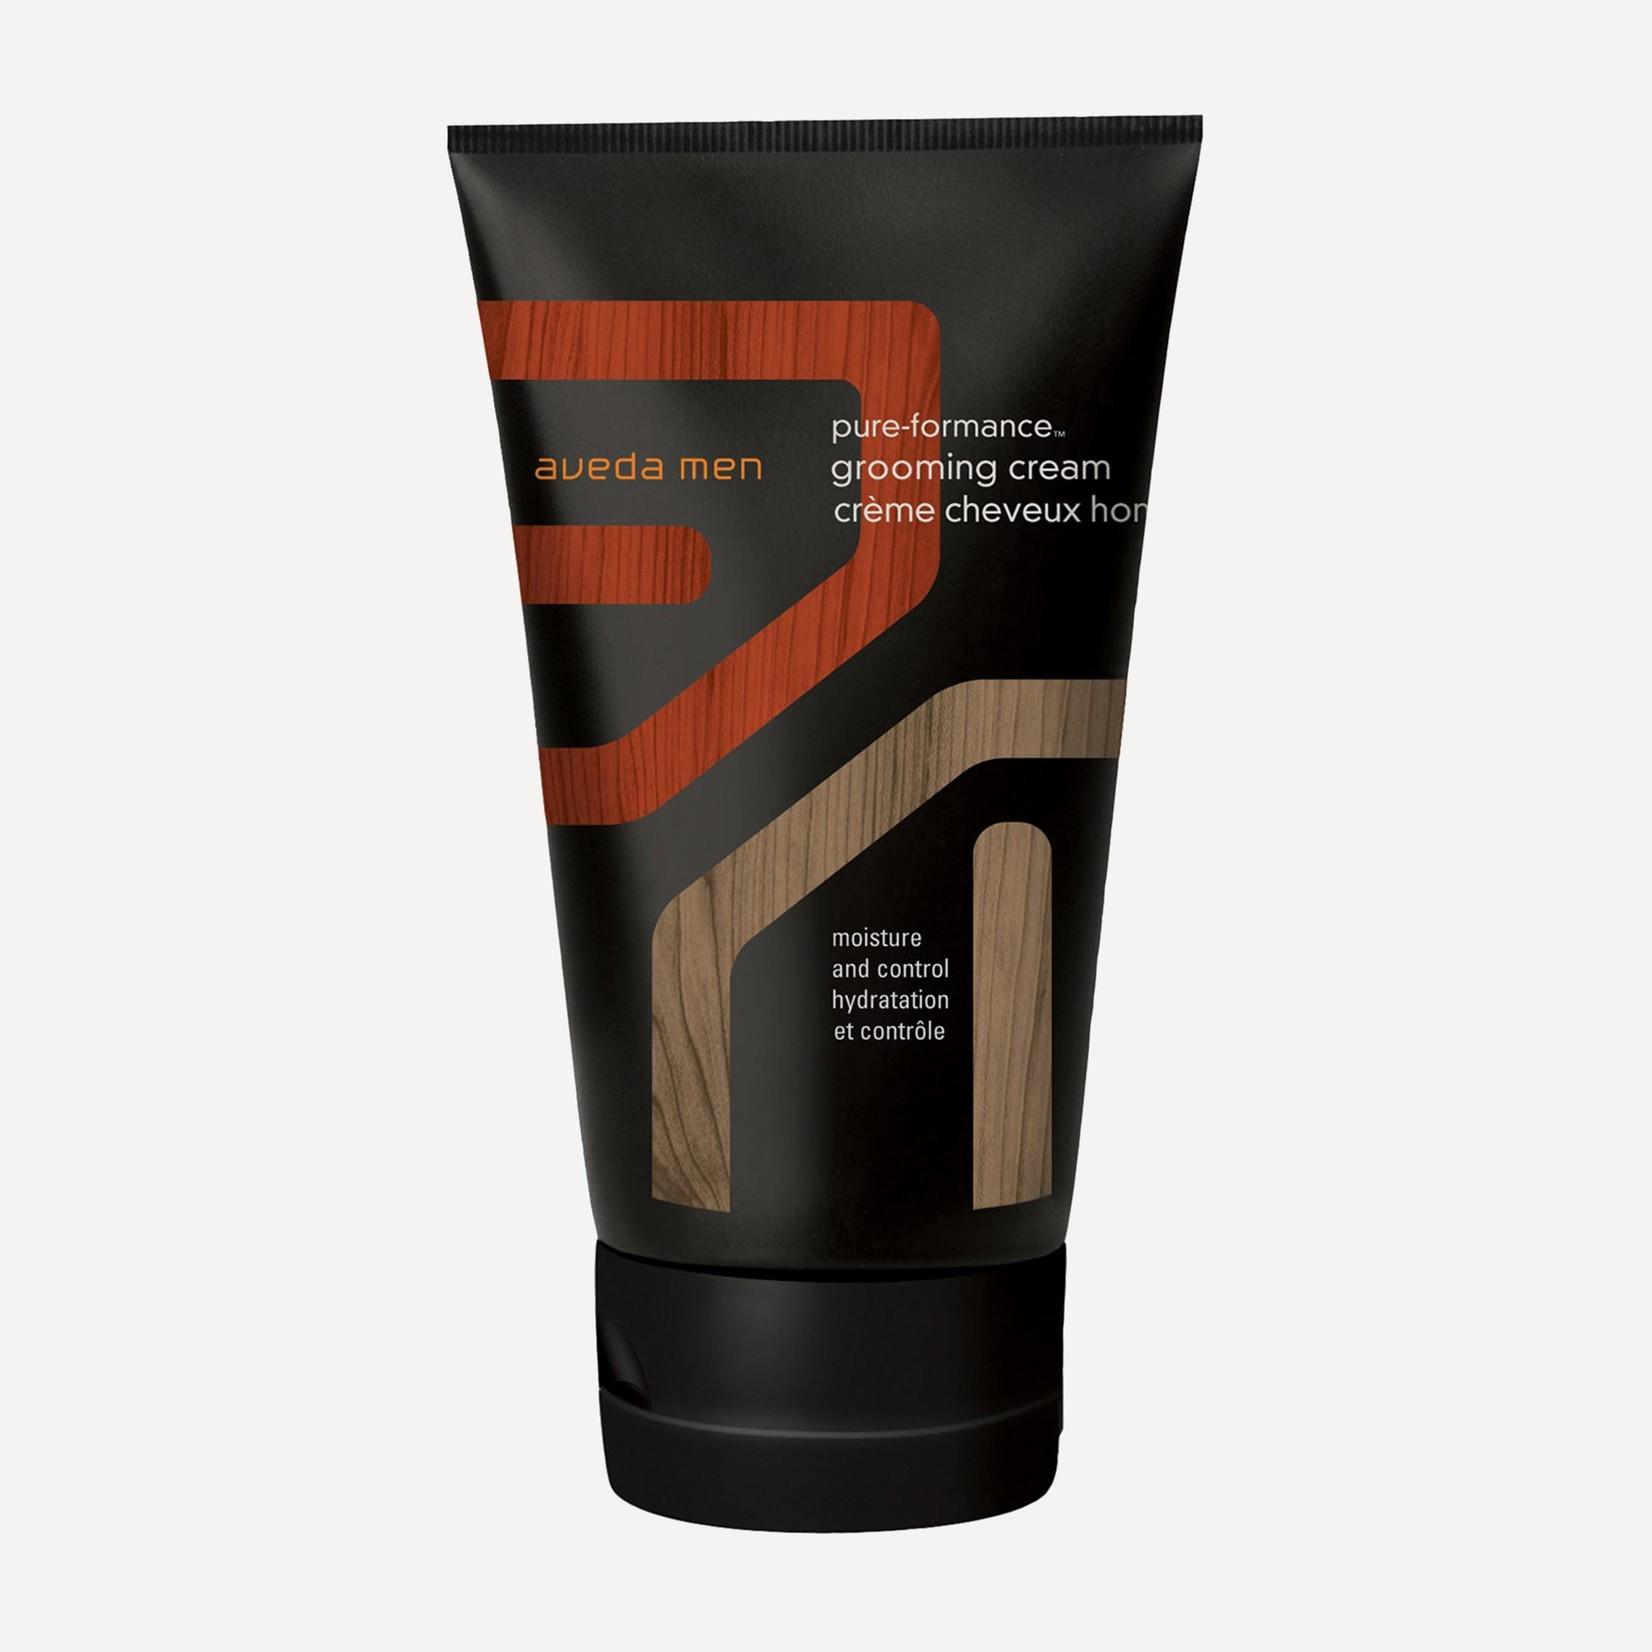 AVEDA Men Pure-Formance™ Grooming Cream